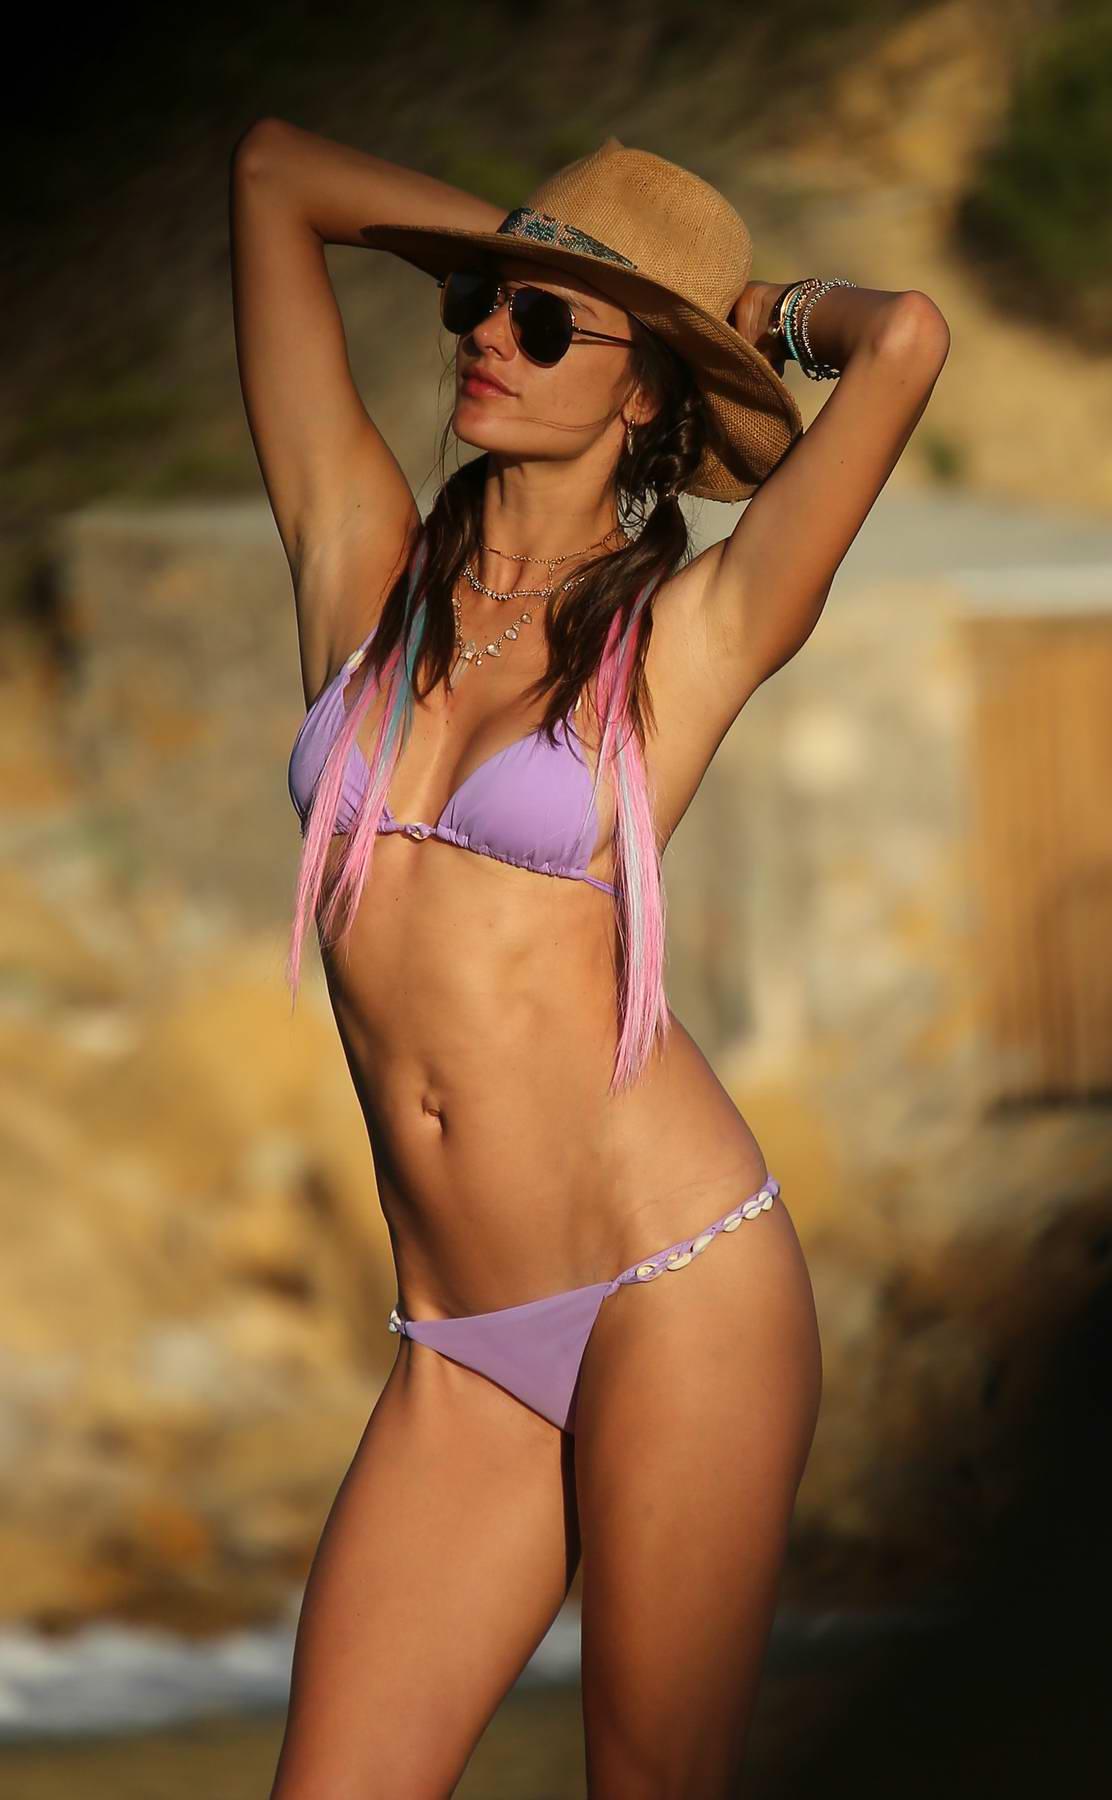 Alessandra Ambrosio in Purple Bikini on the Beach in Ibiza, Spain